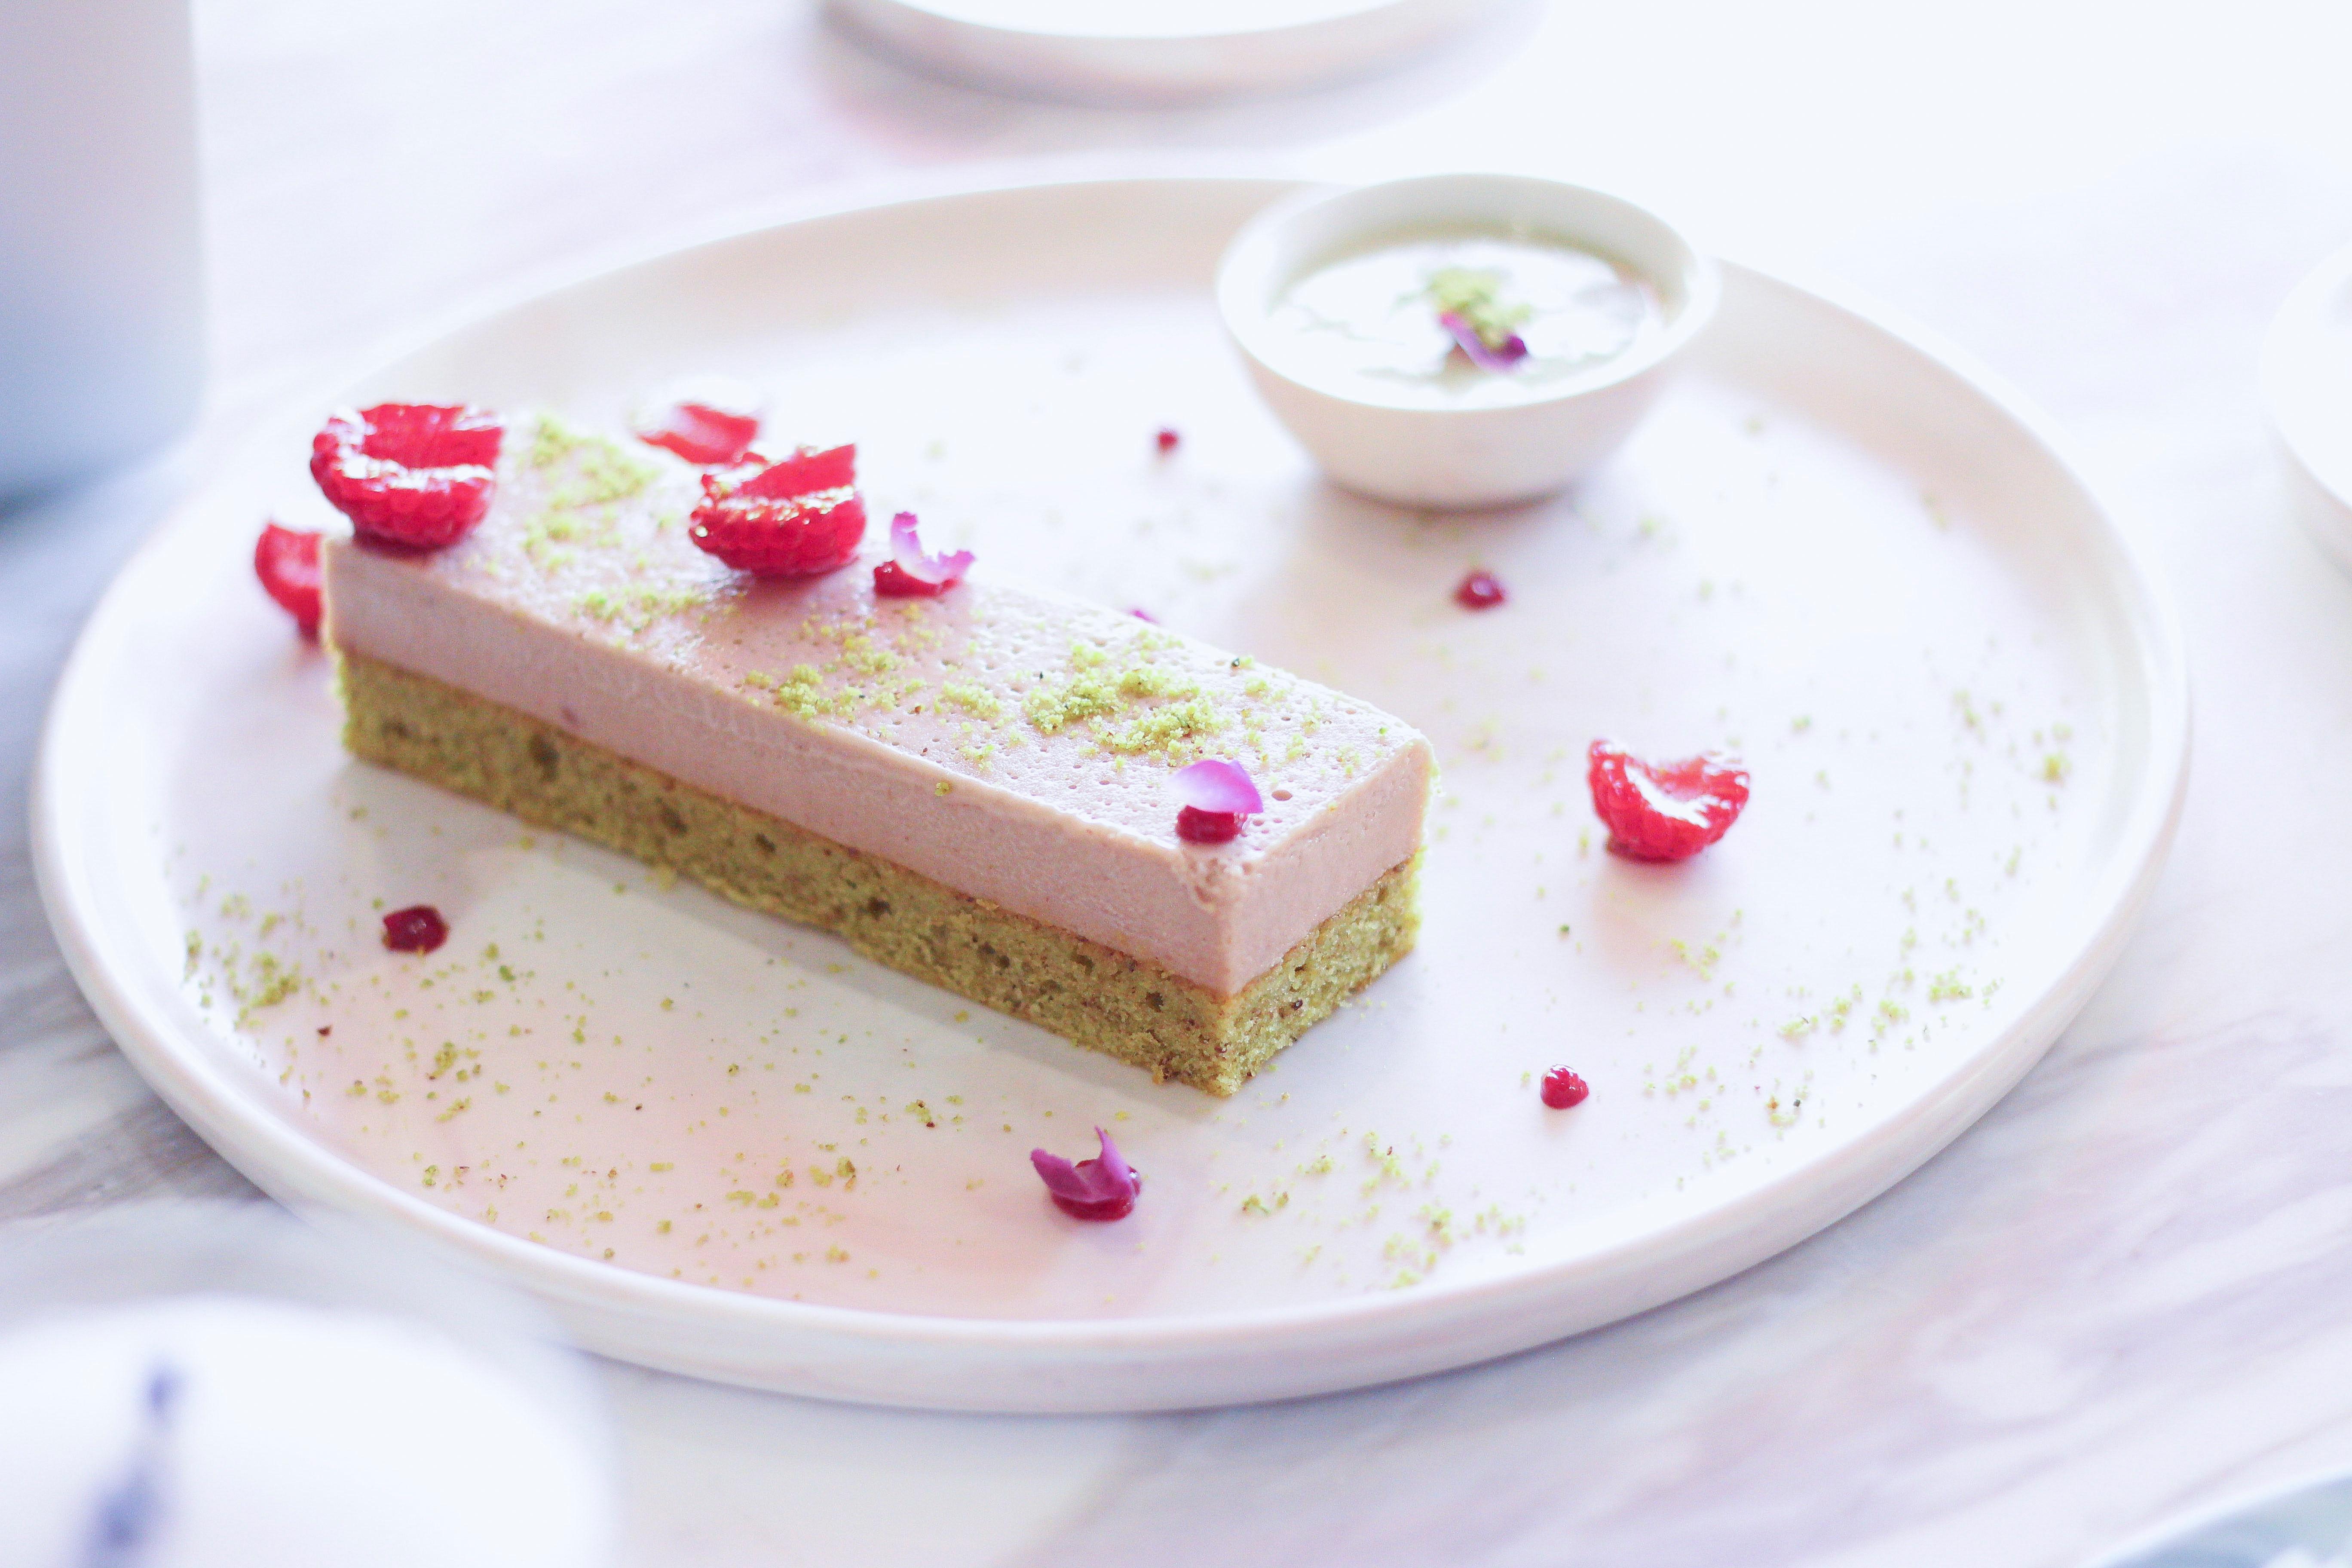 Cake Tasting & Consultation for Five